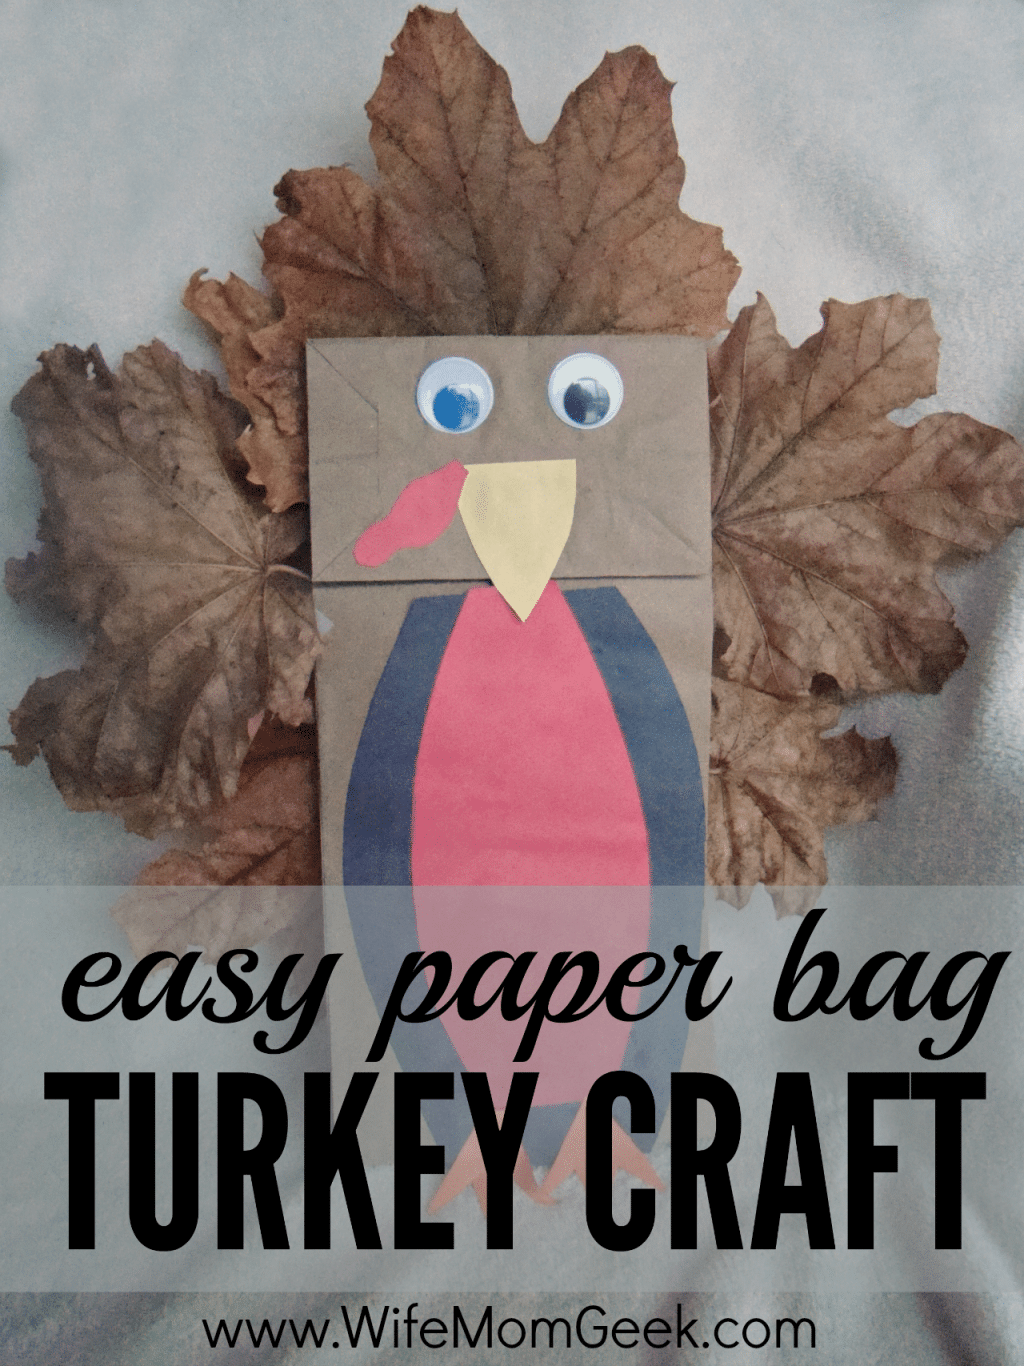 Easy Paper Bag Turkey Craft